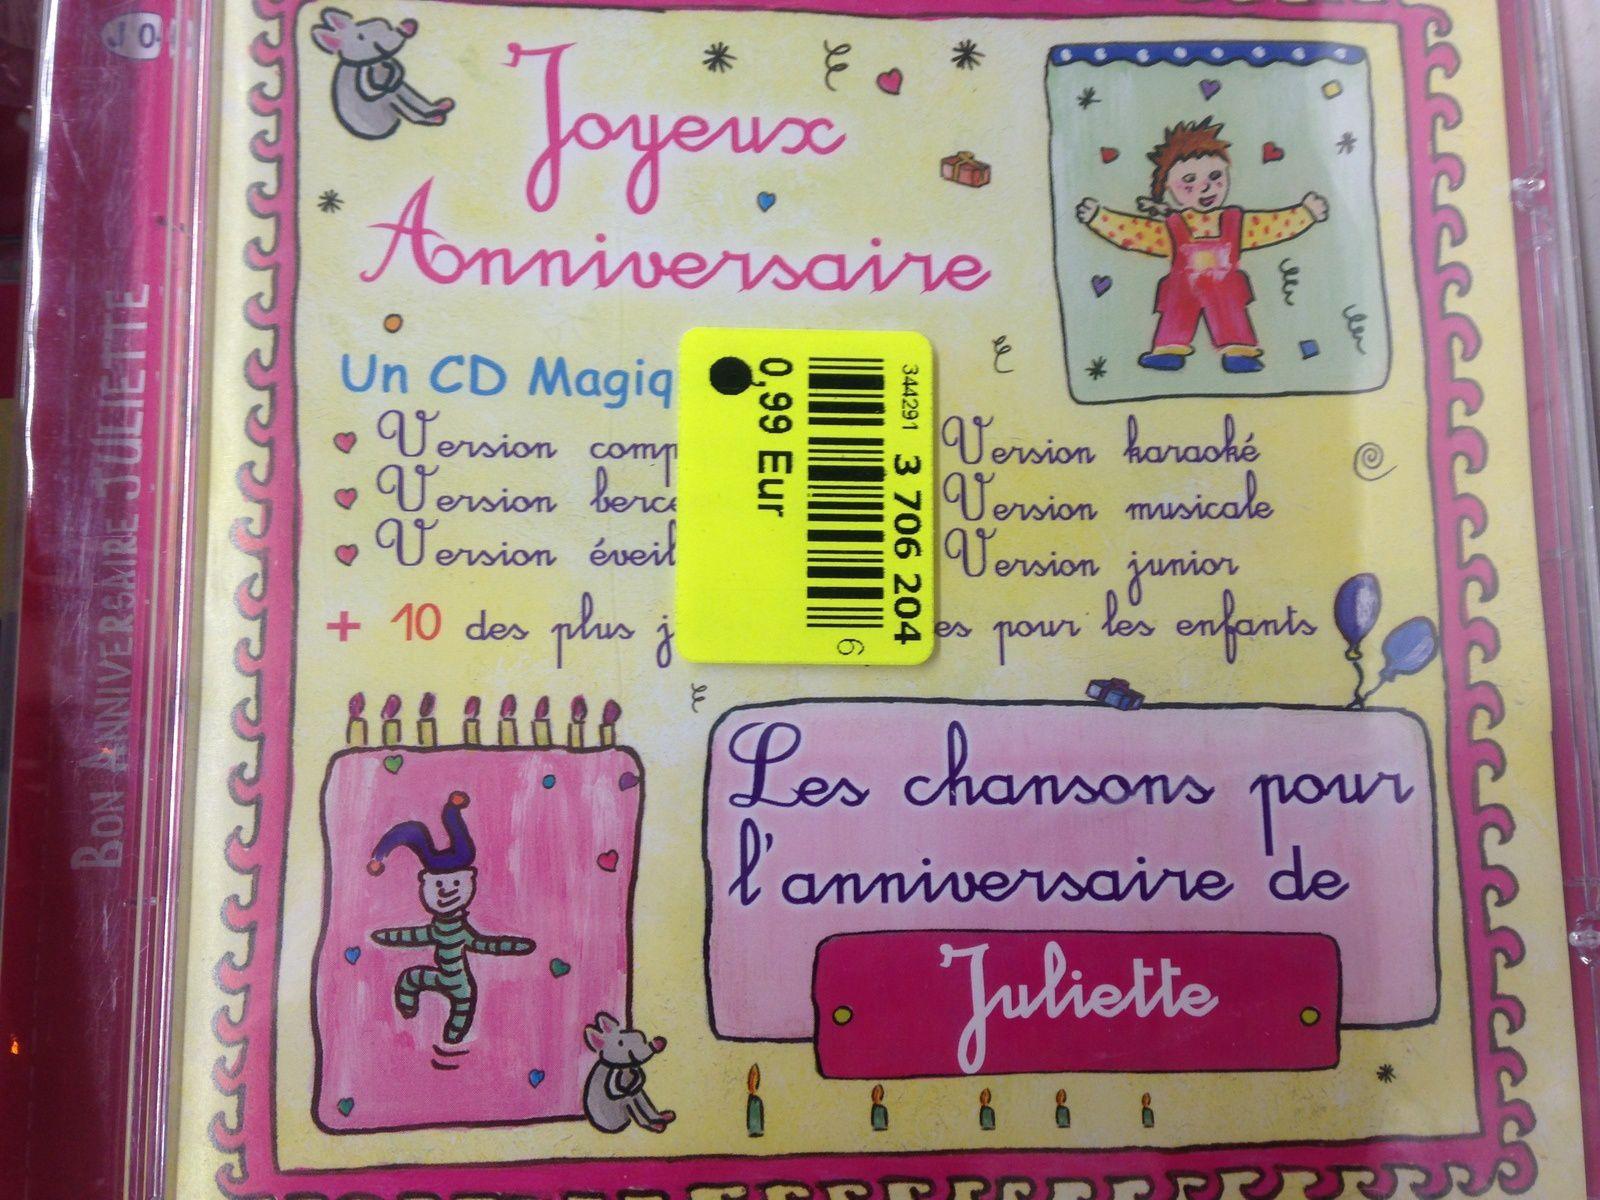 #juliette #prenom #charlotteblabla blog